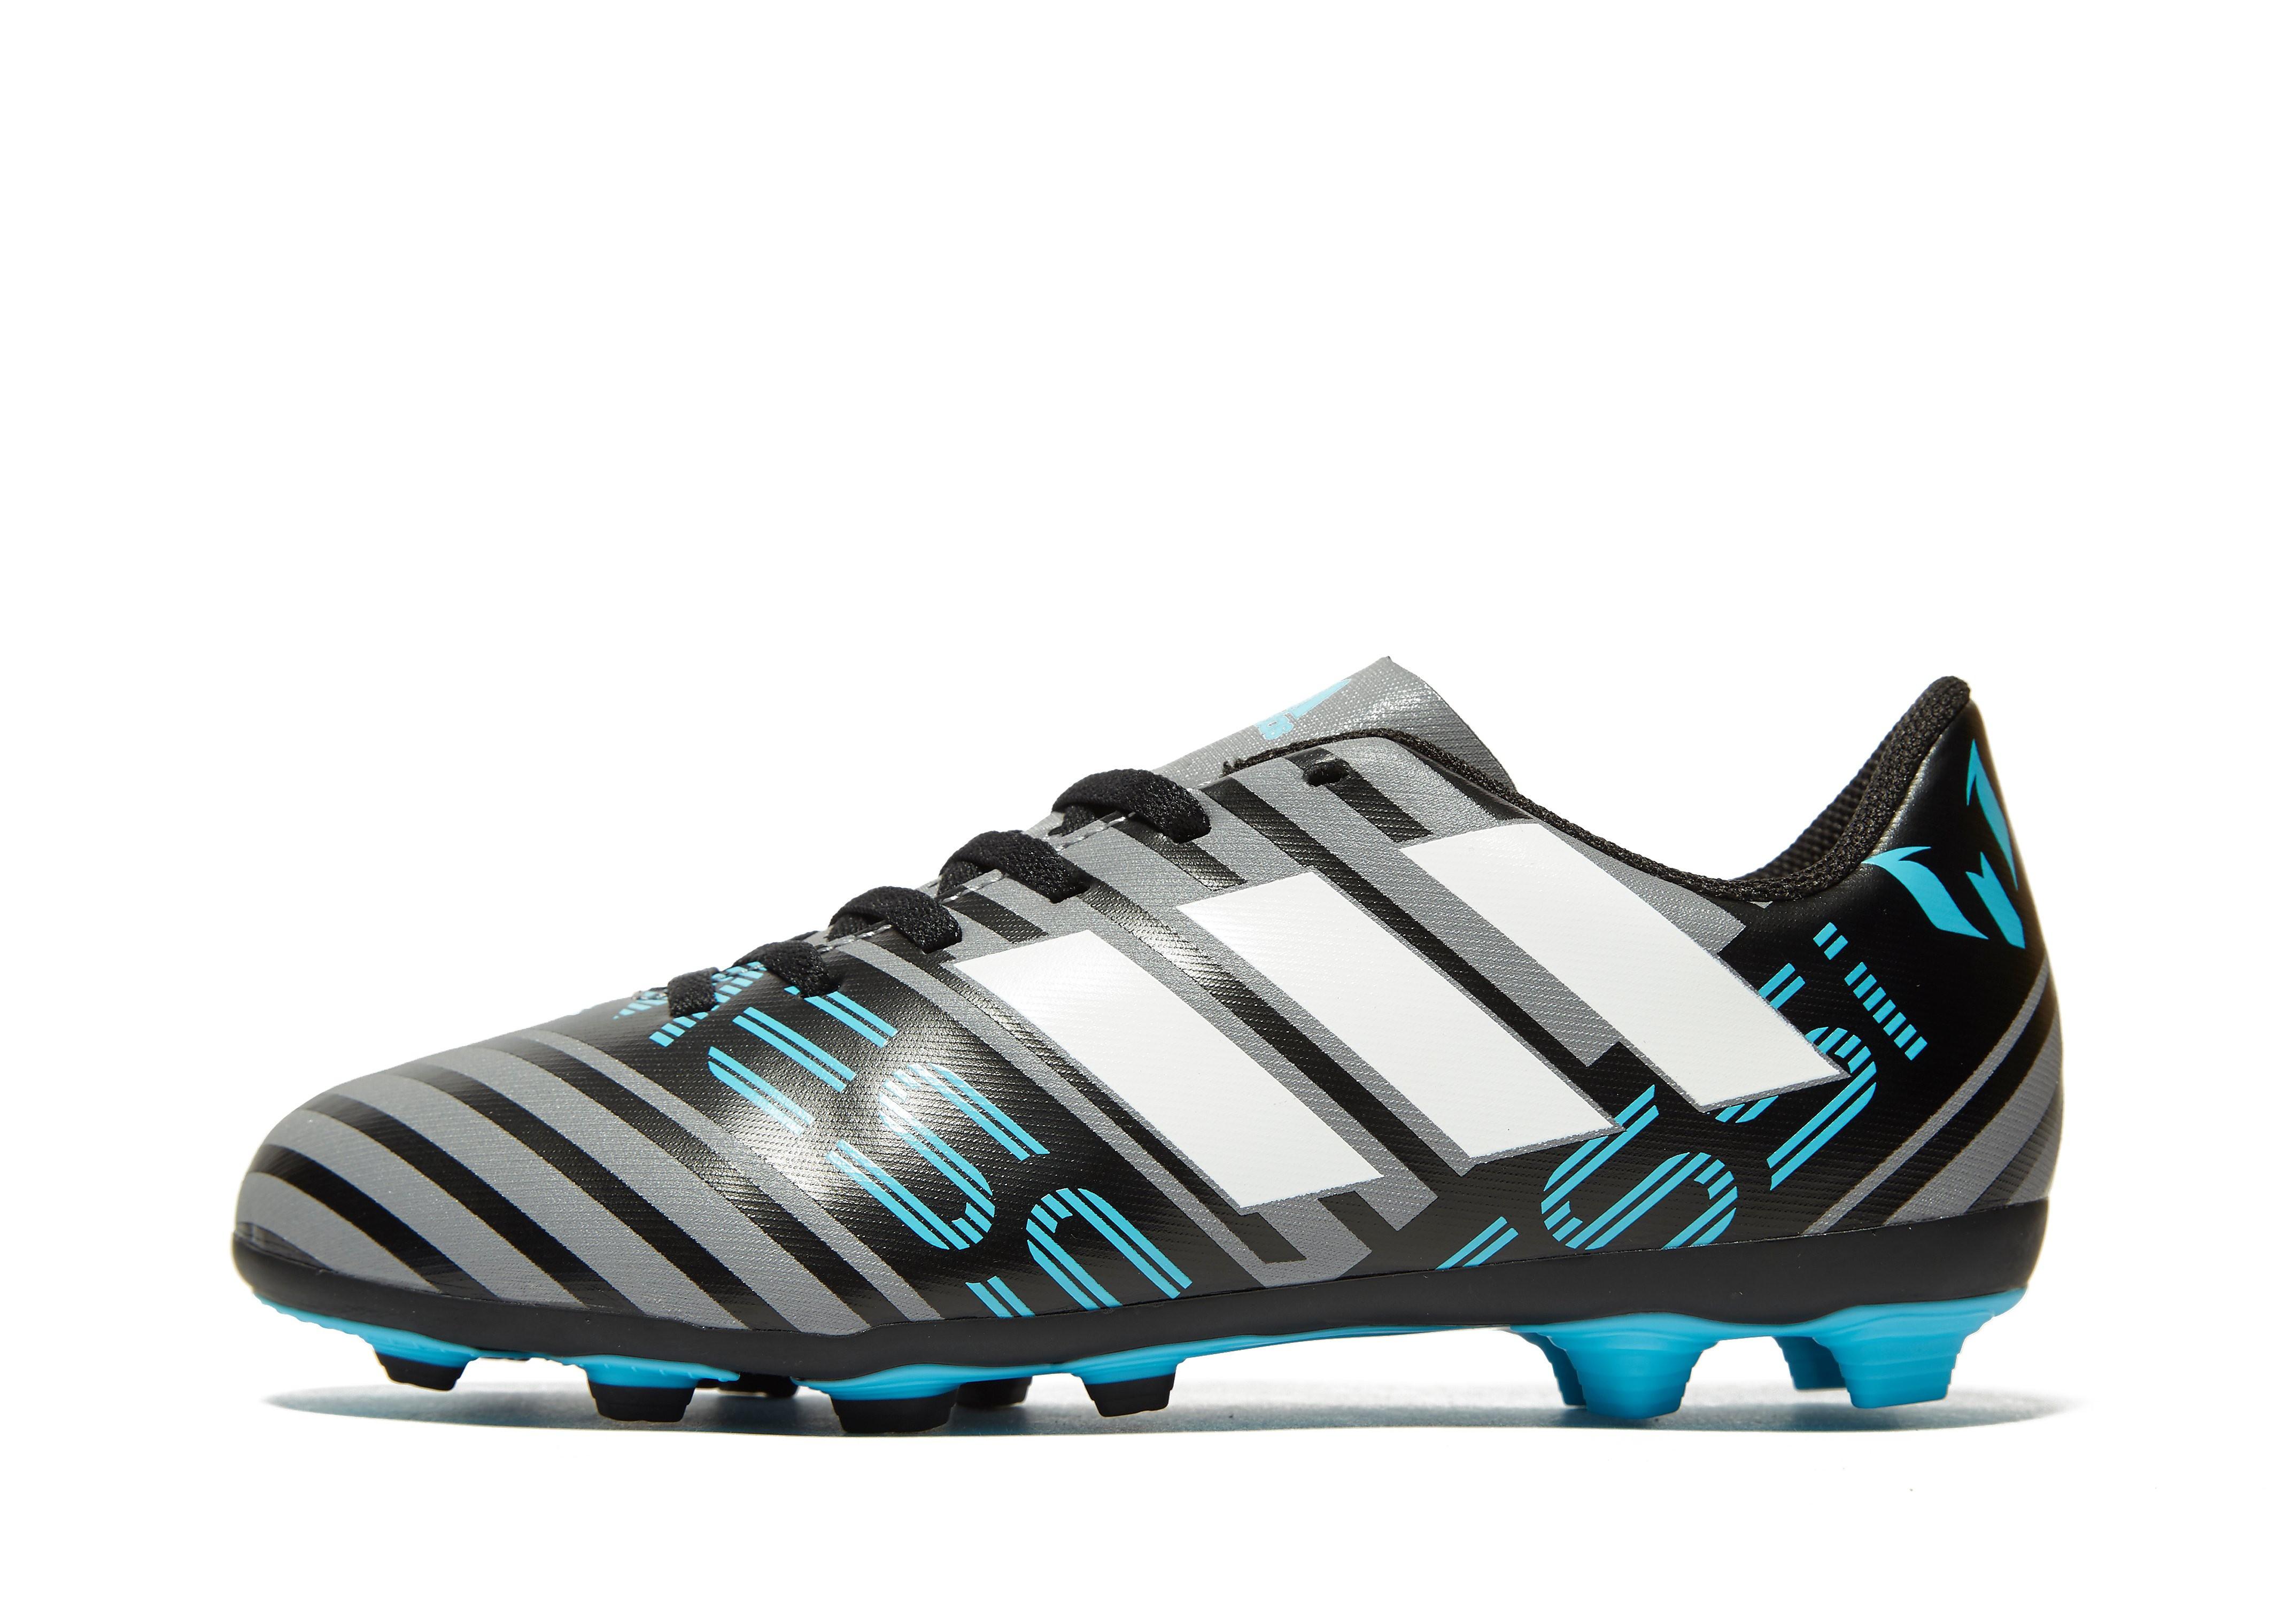 adidas Cold Blooded Nemeziz Messi 17.4 FG Children